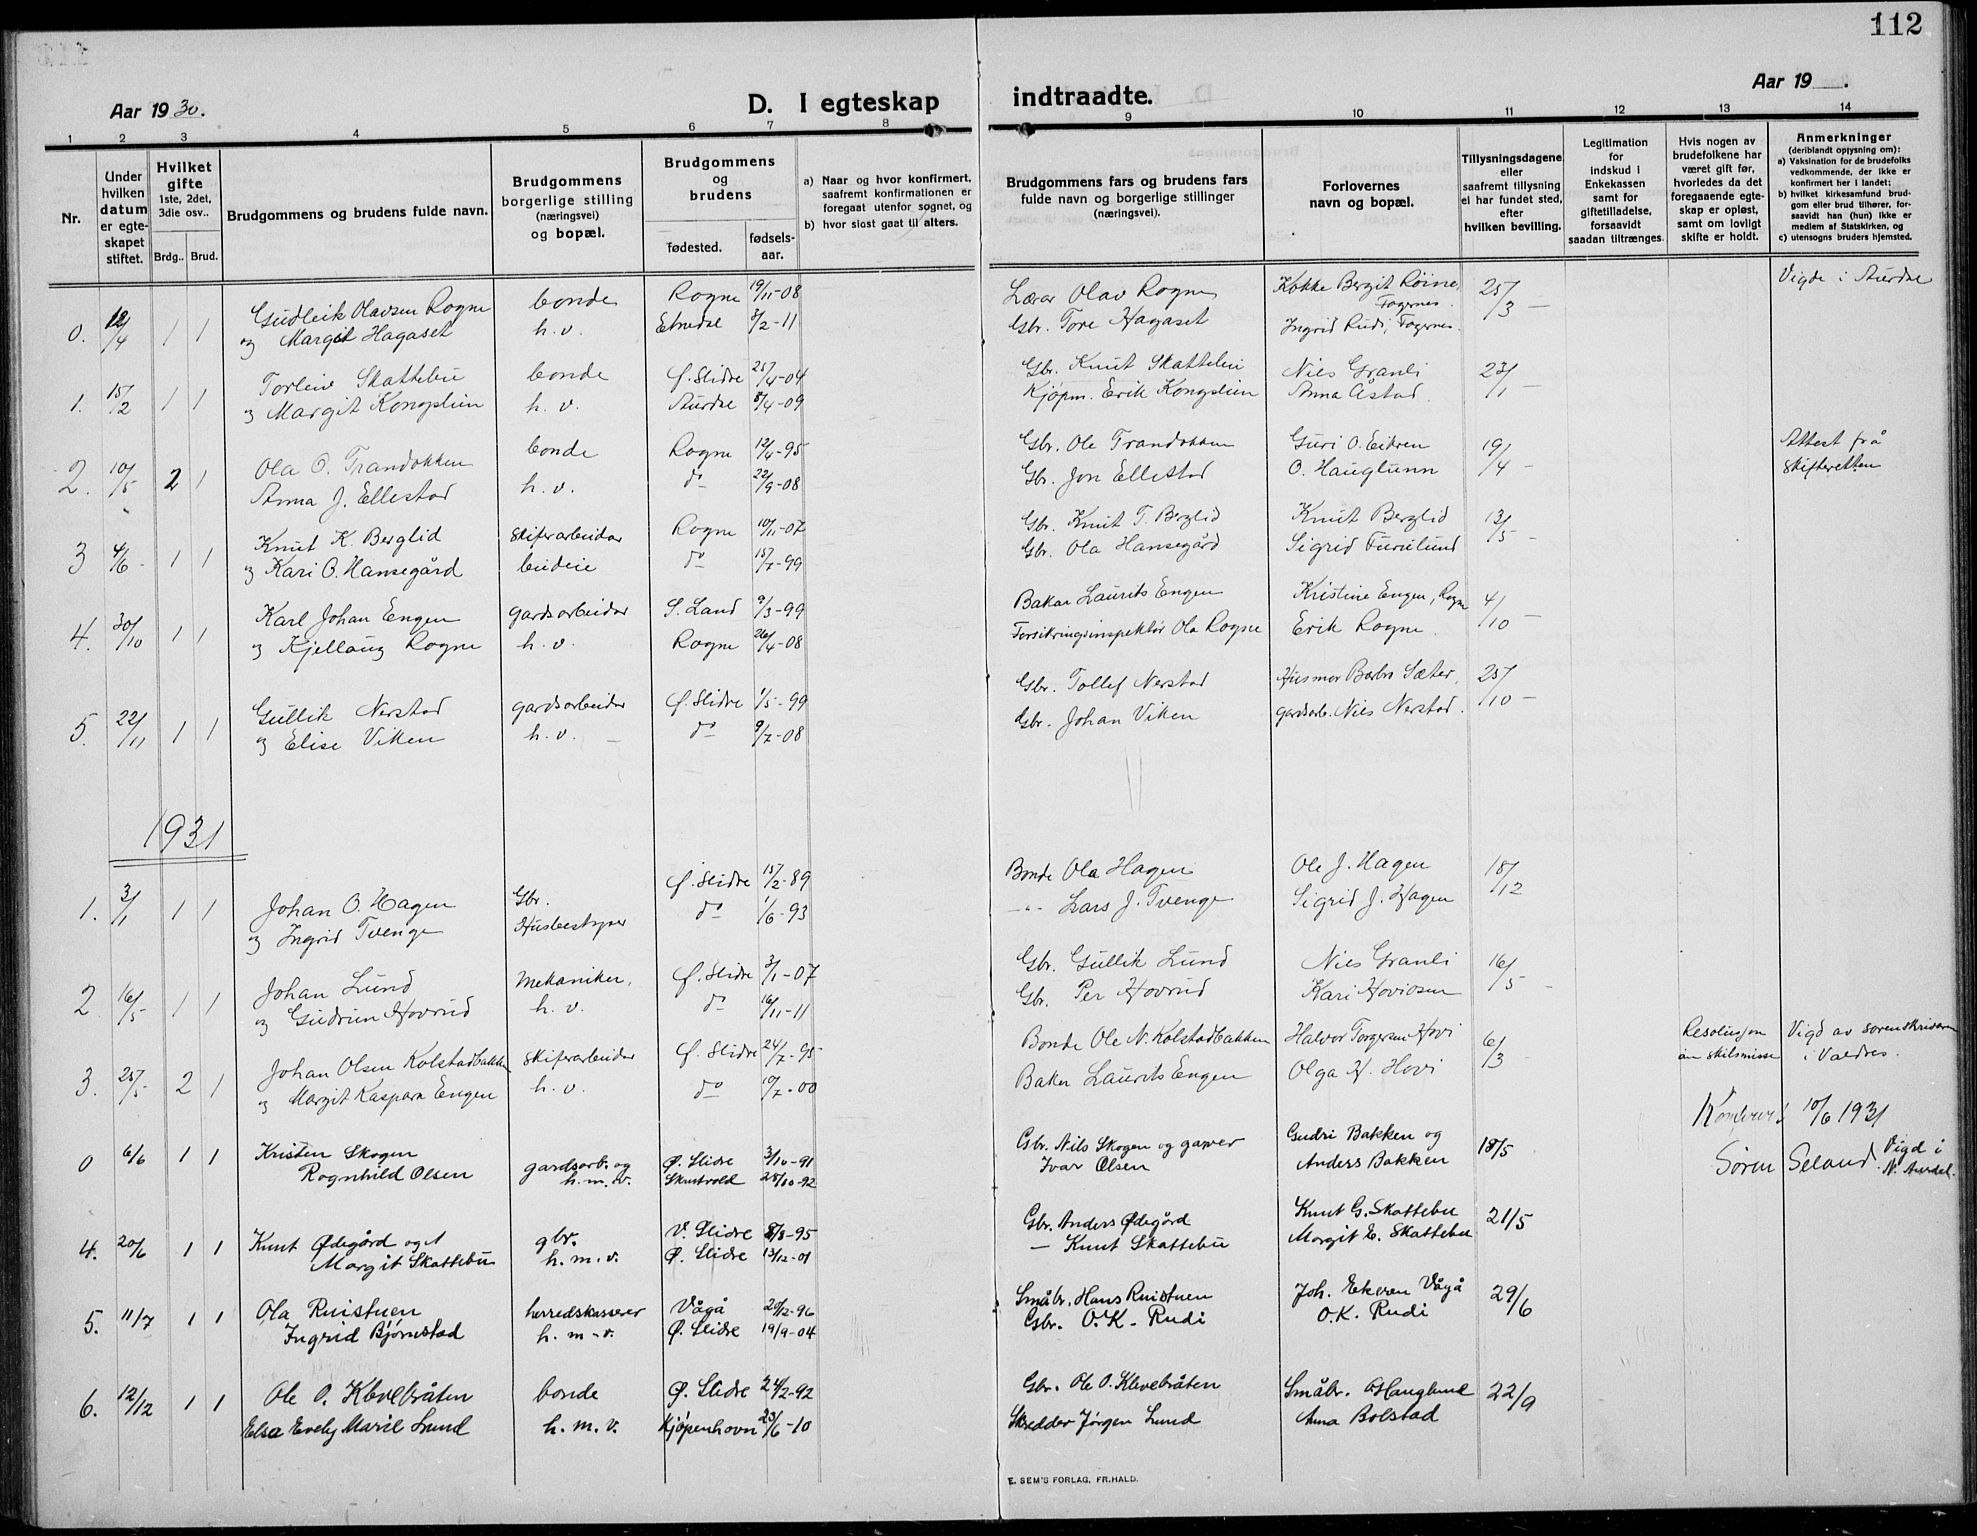 SAH, Øystre Slidre prestekontor, Klokkerbok nr. 8, 1911-1938, s. 112